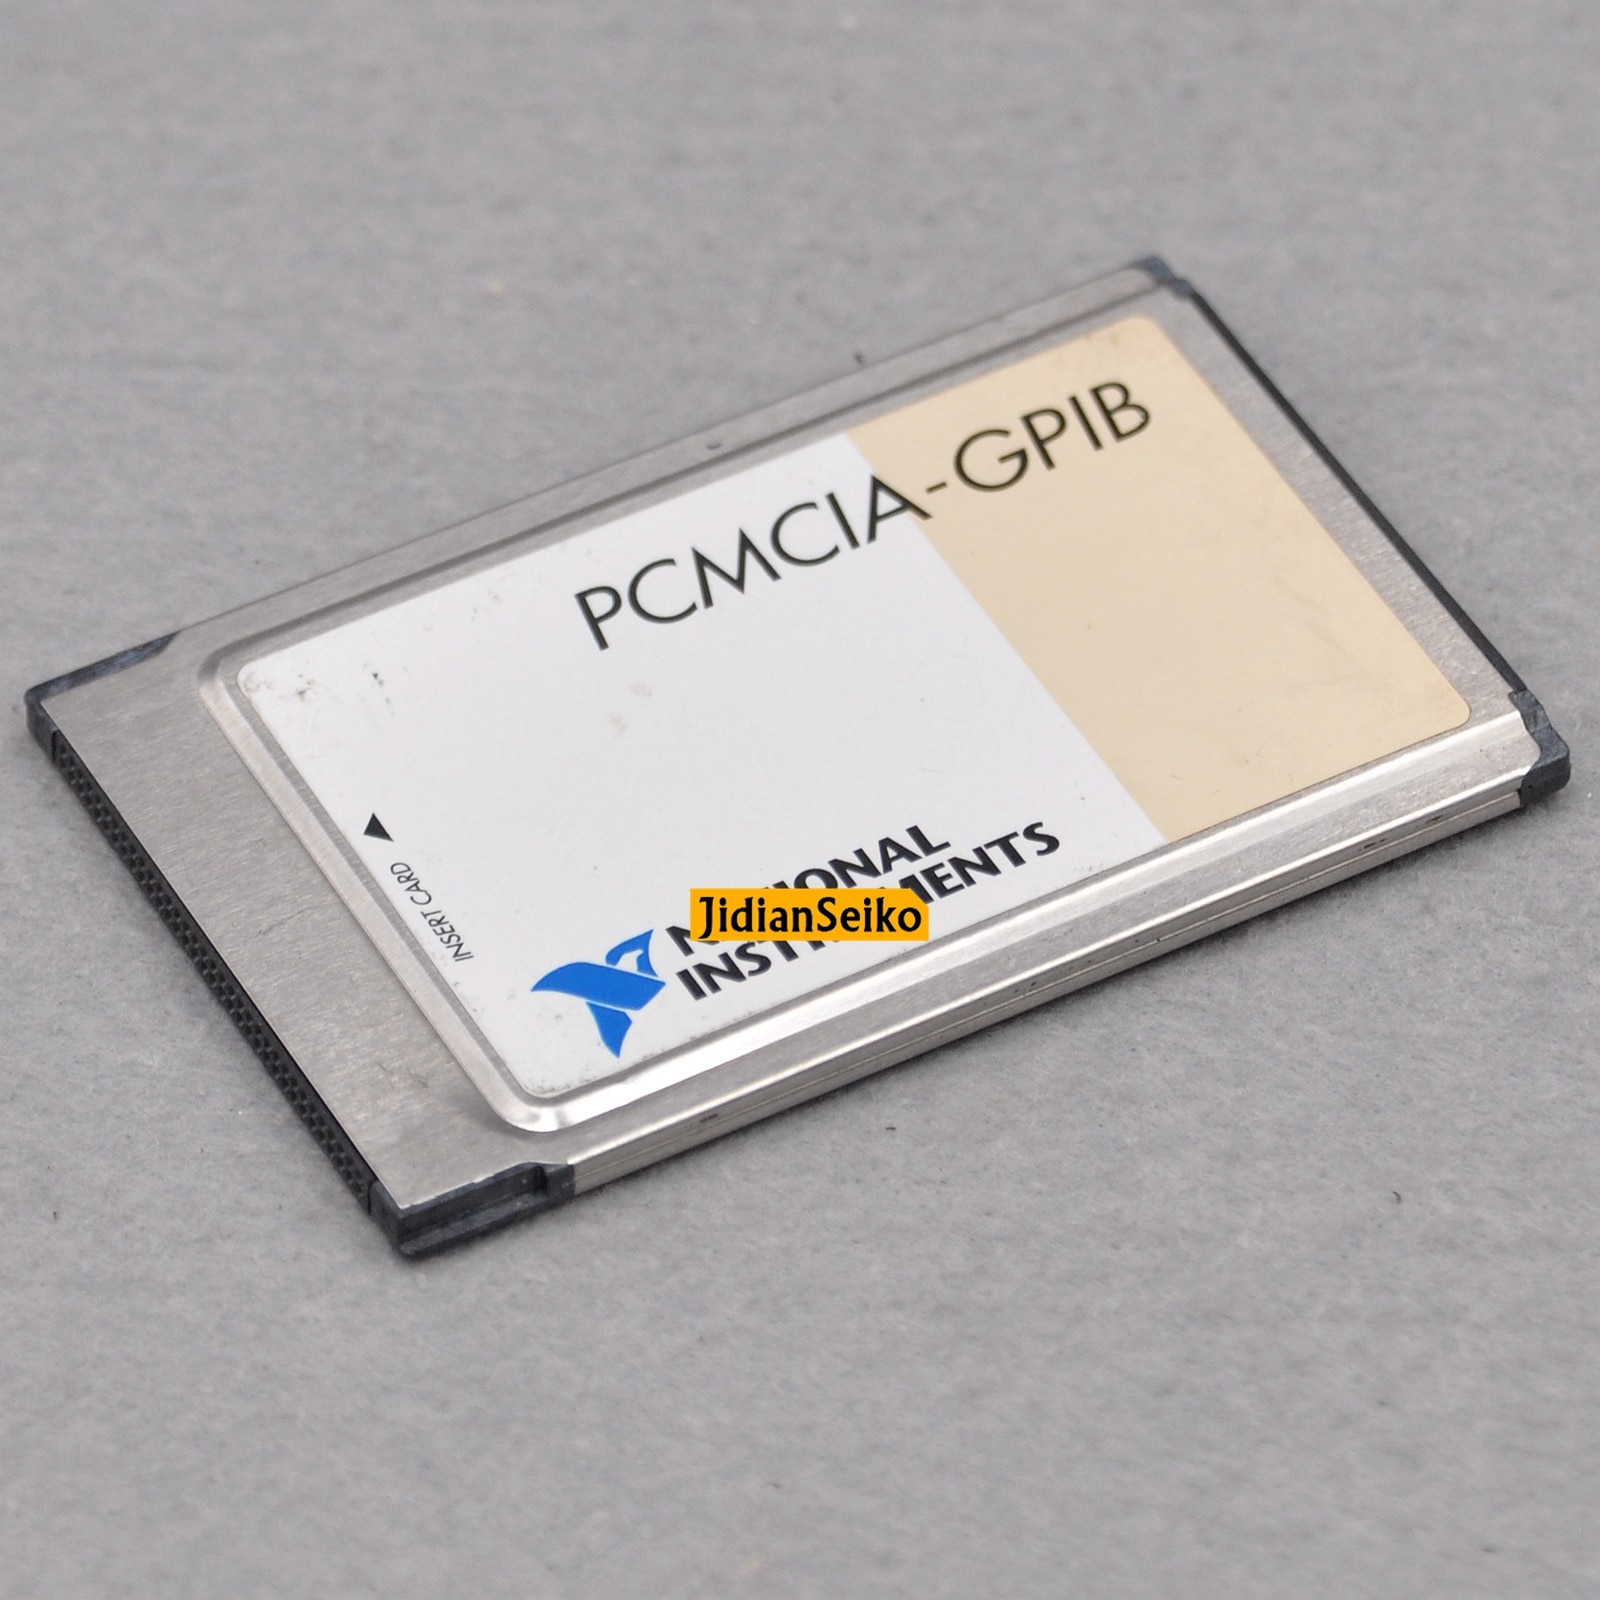 PCMCIA-GPIB 184713B-01 110mA 5V IEEE488 card data acquisition card